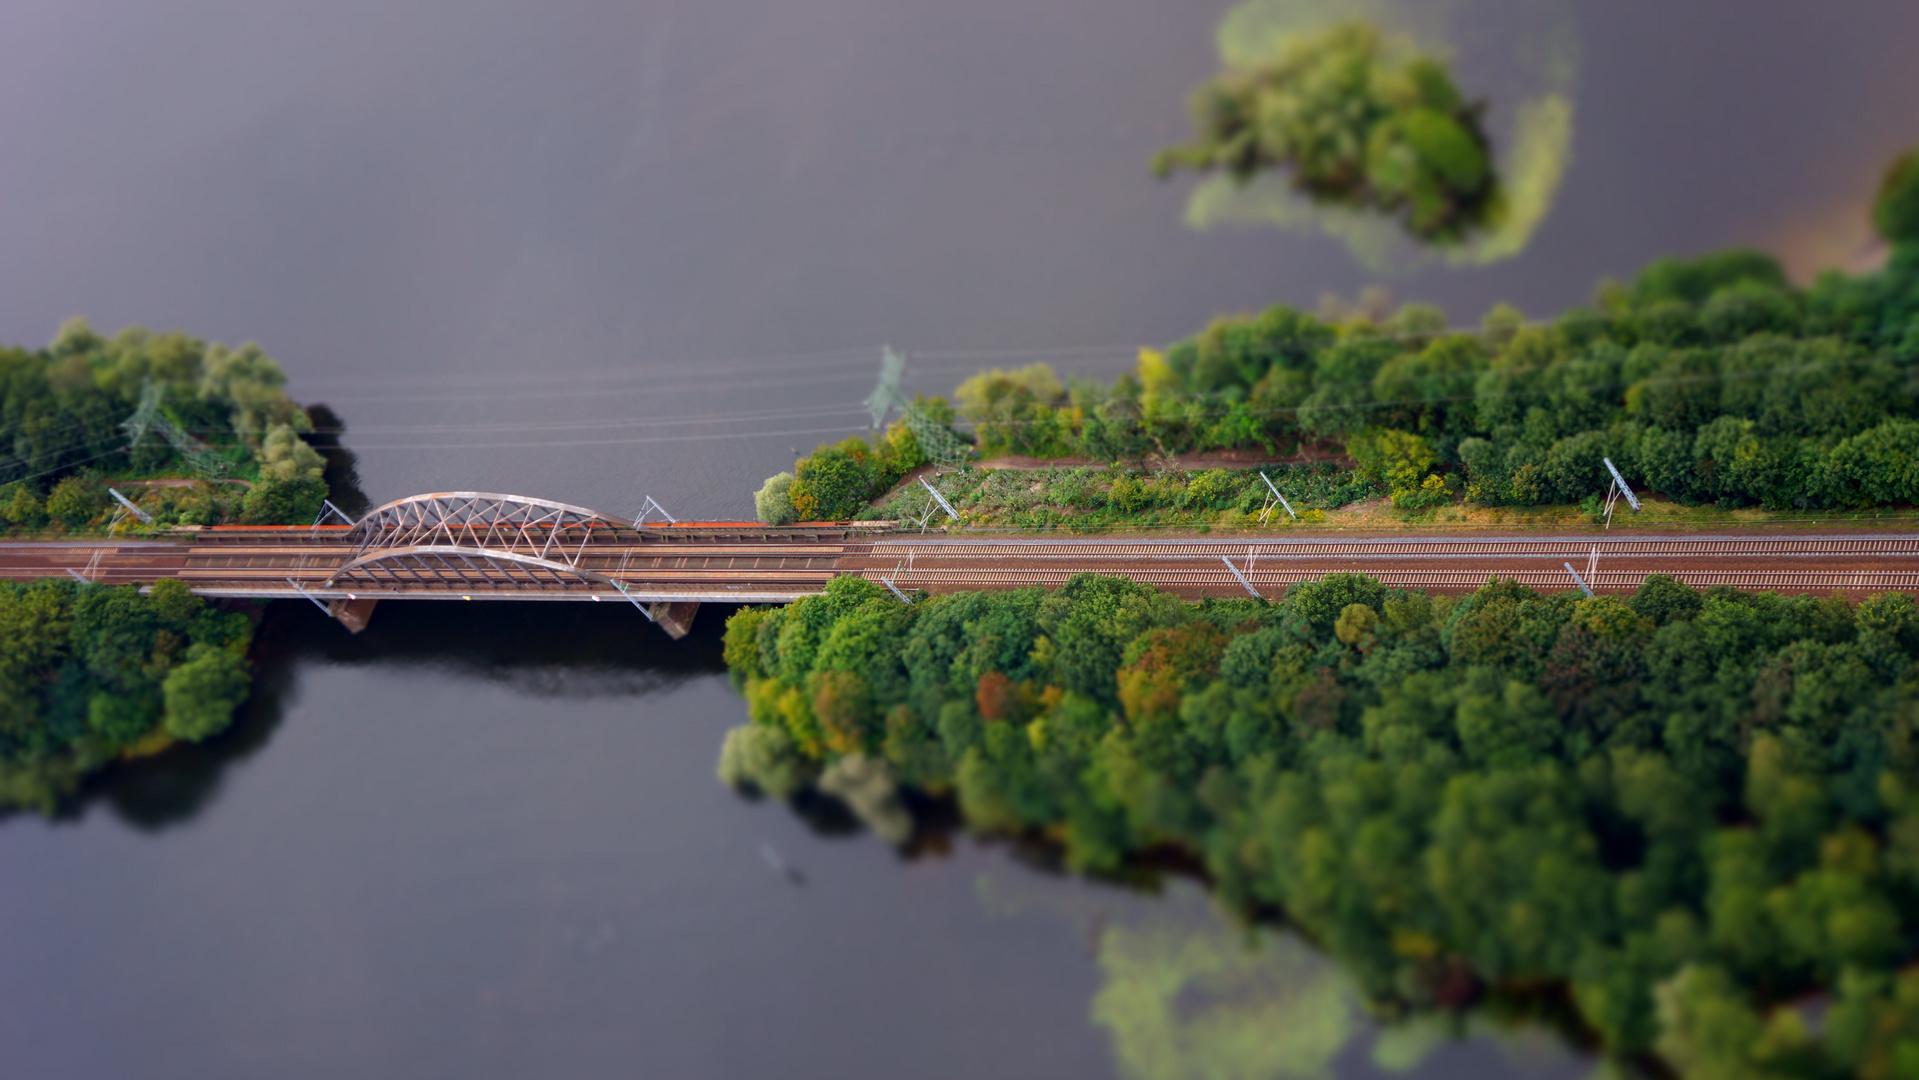 Brücke über den Templiner See bei Potsdam